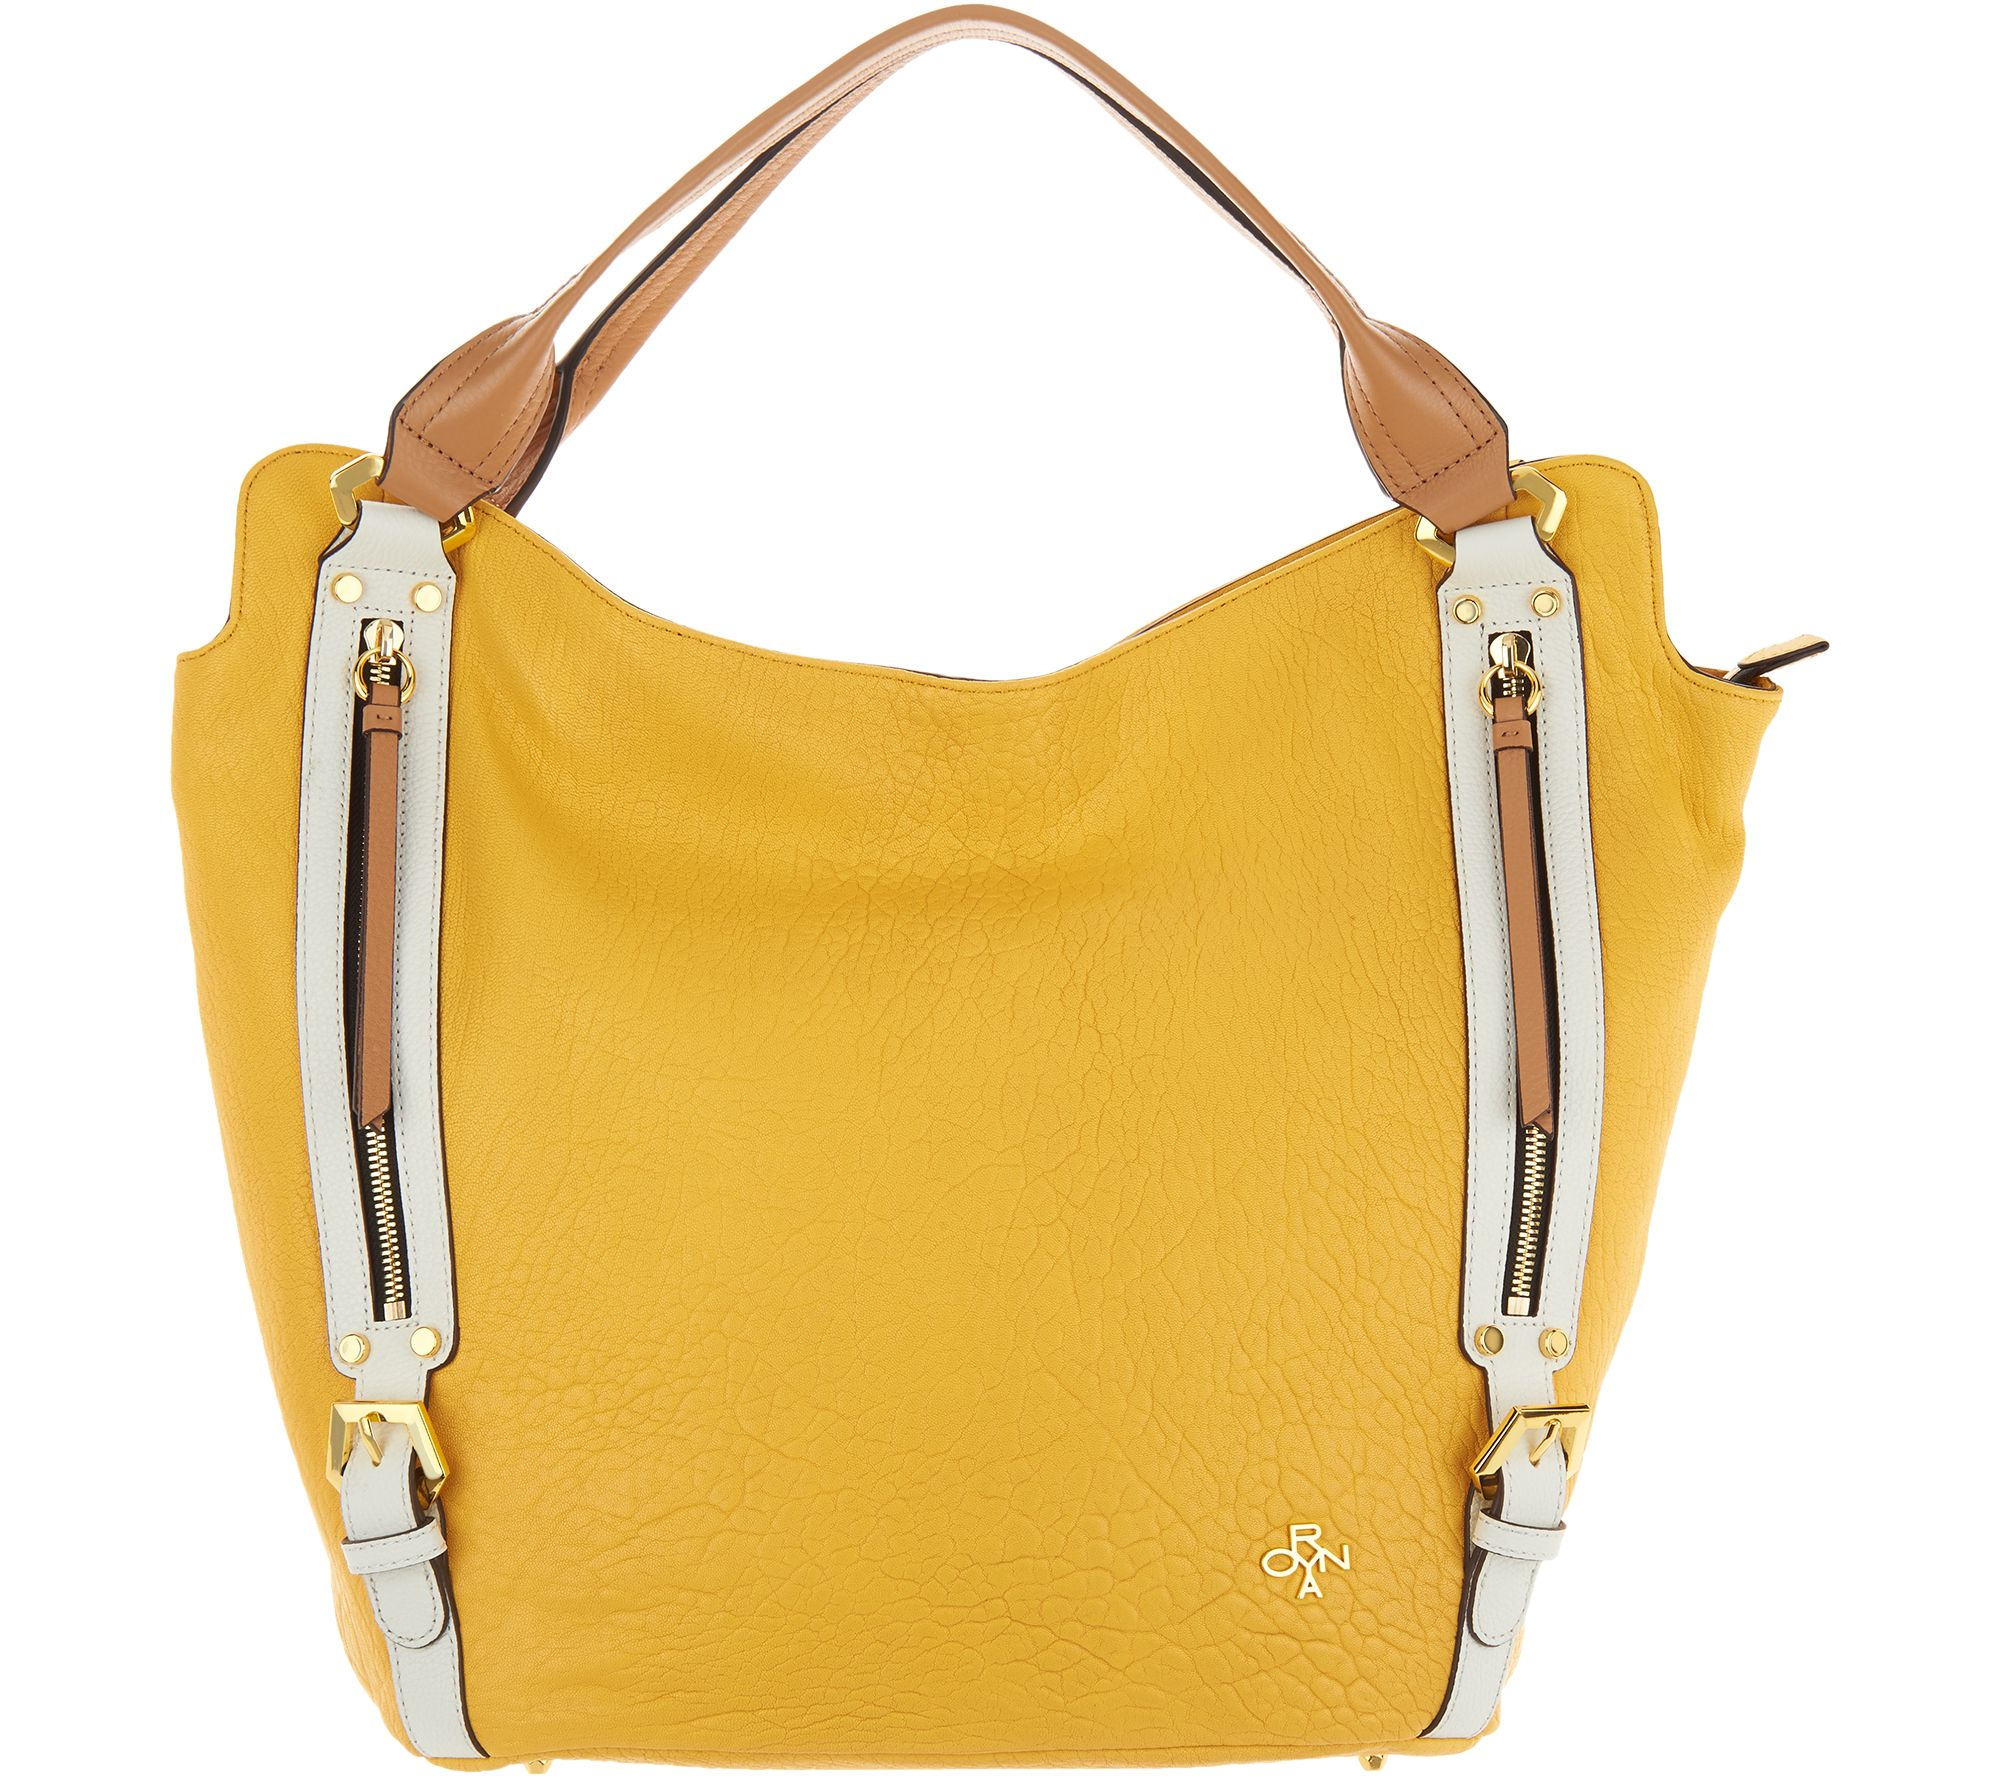 bdc43e8f1f orYANY Lamb Leather Tote Handbag -Lauren - Page 1 — QVC.com